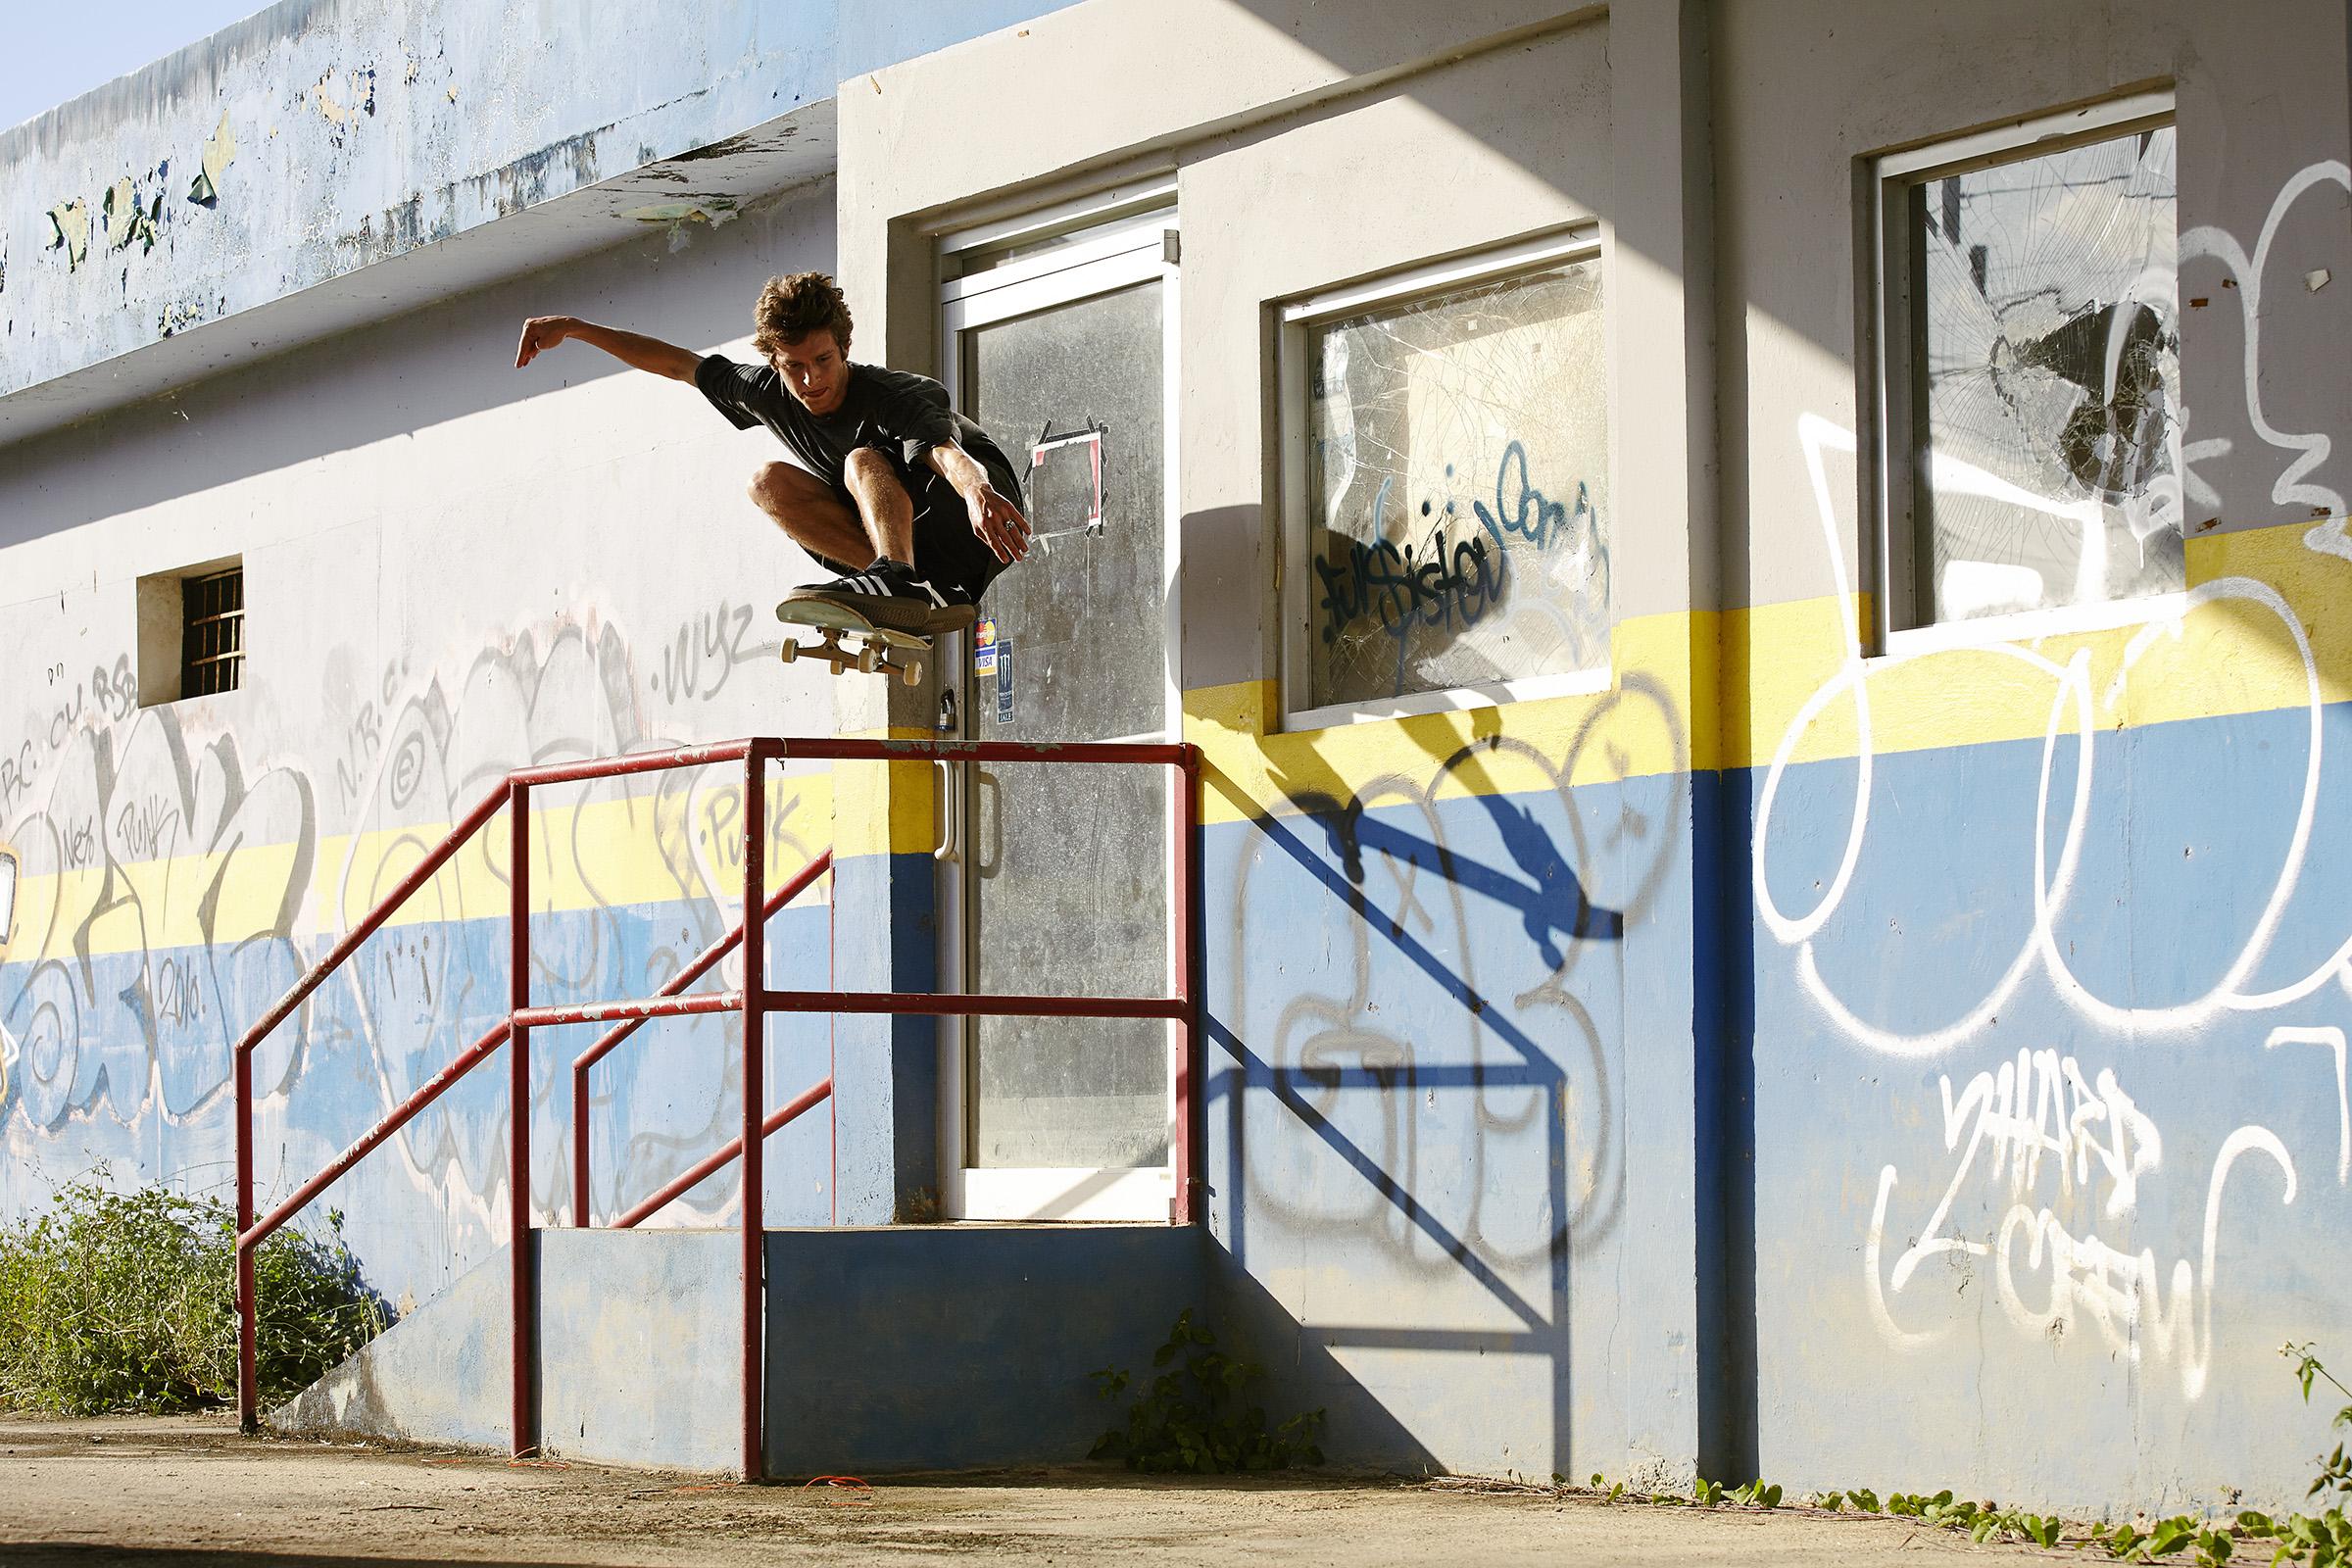 Jimmy Lannon - Ollie - Manati, Puerto Rico - Photo: Will Jivcoff